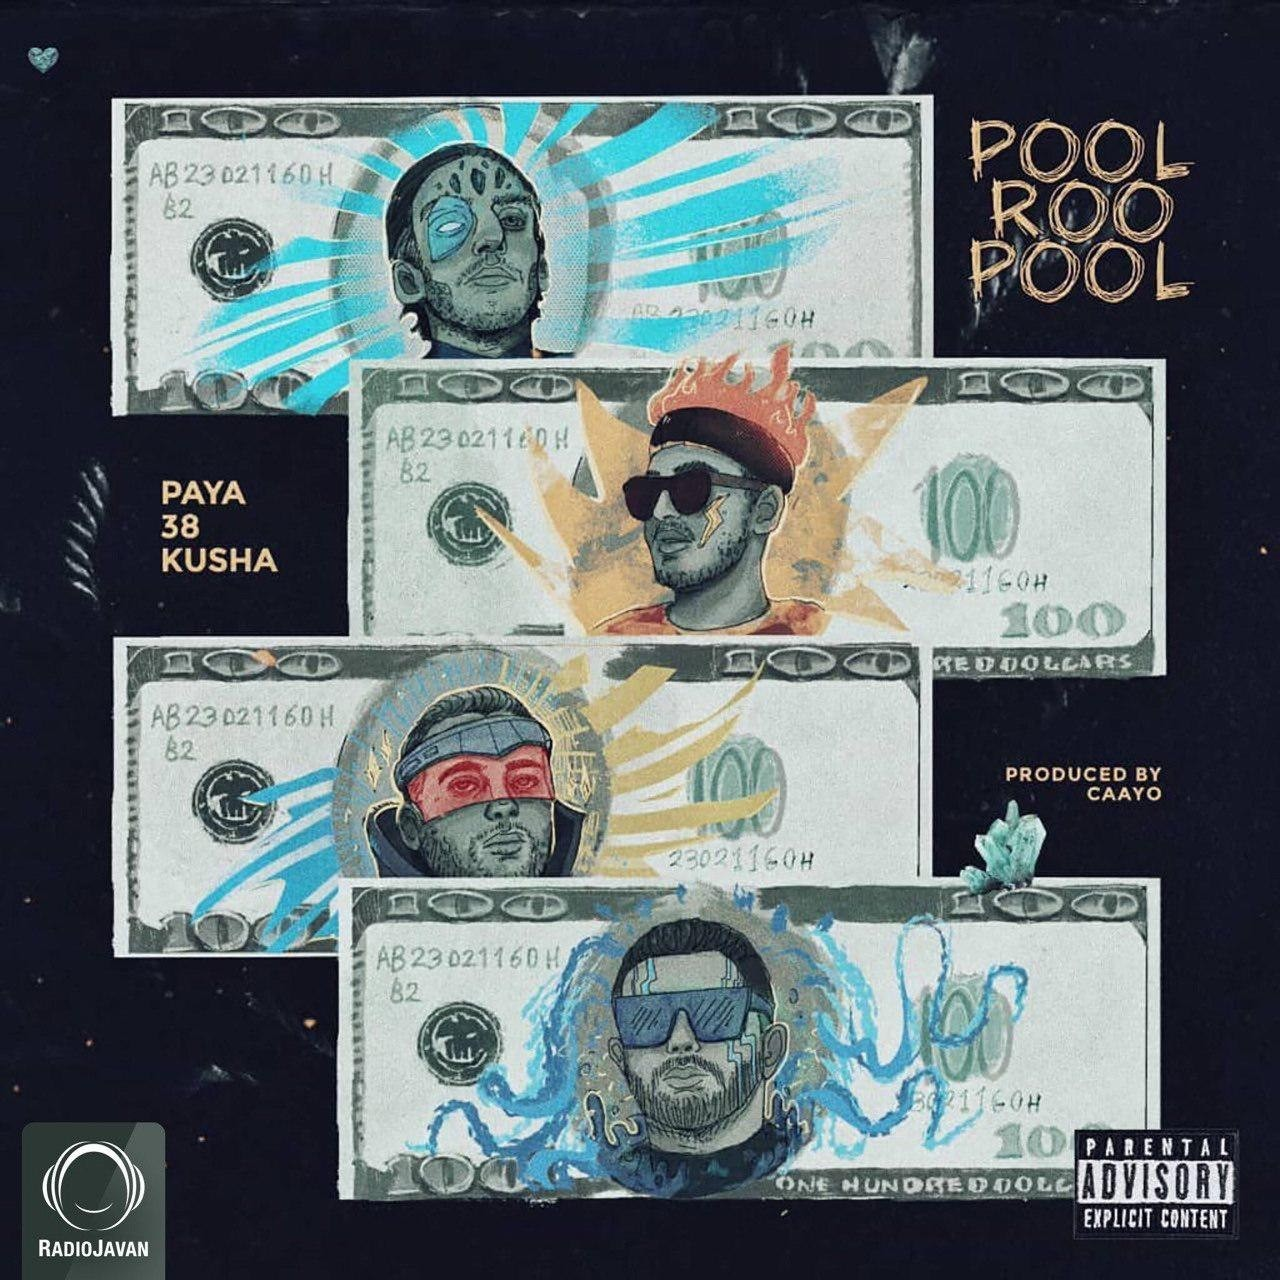 Paya – Pool Roo Pool